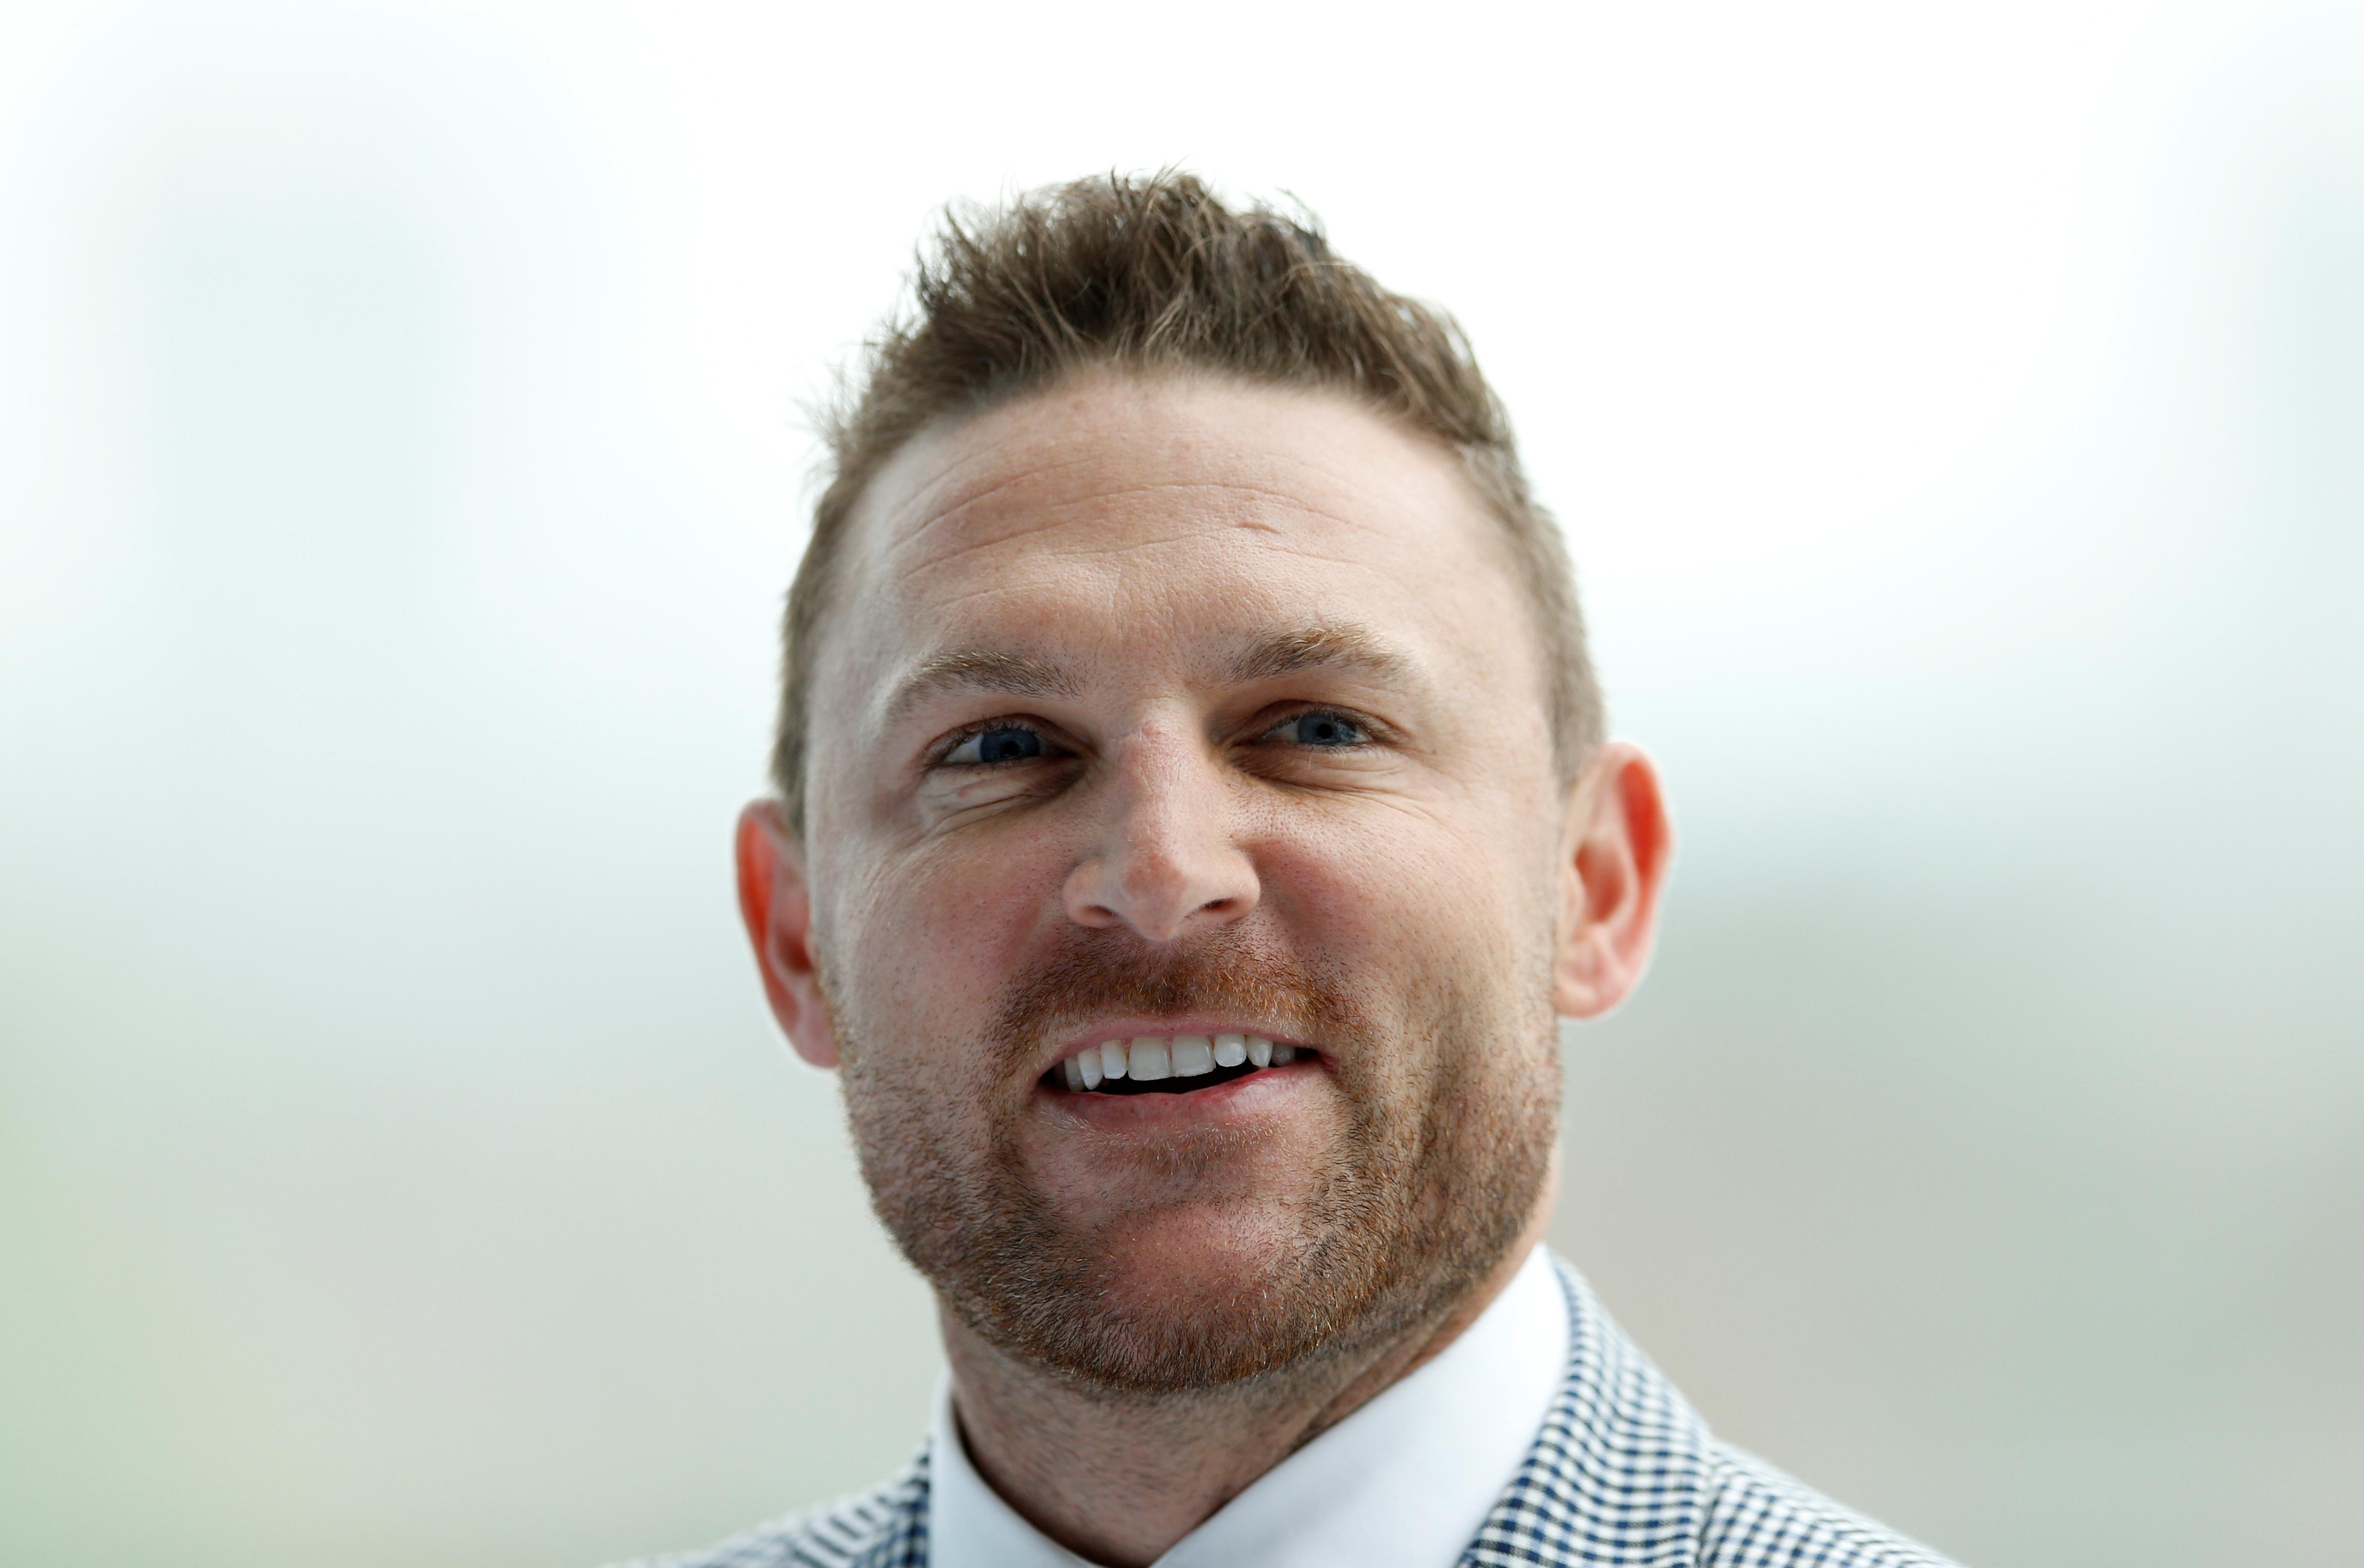 McCullum named Kolkata Knight Riders coach in IPL